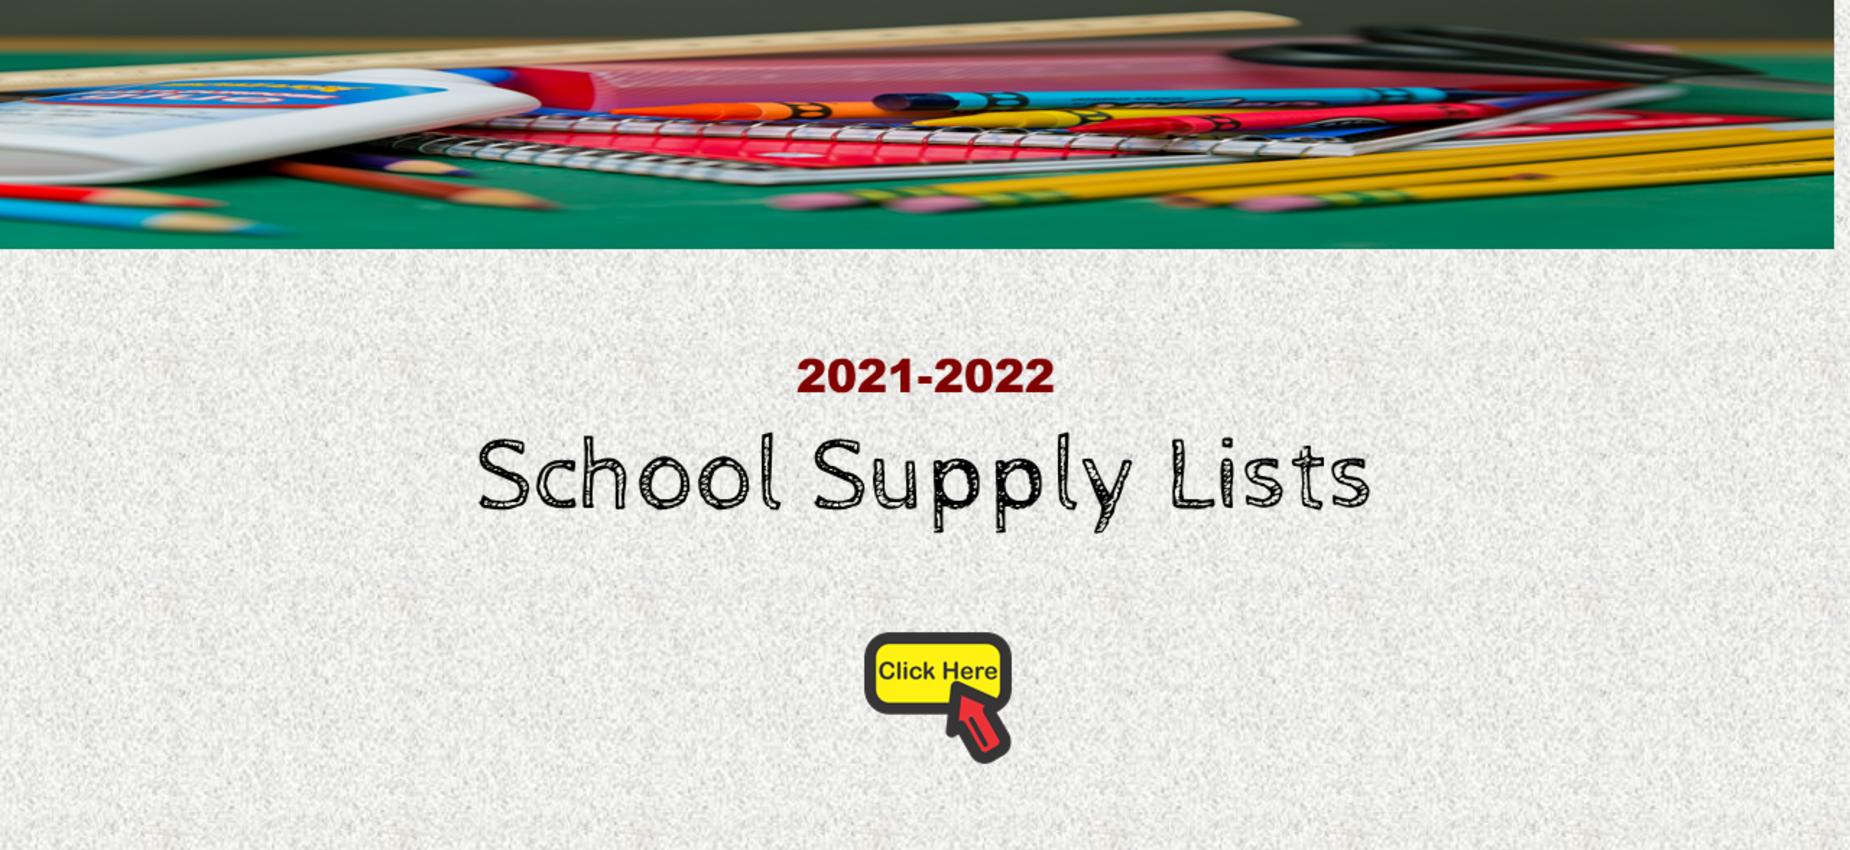 School Supply Lists Graphic